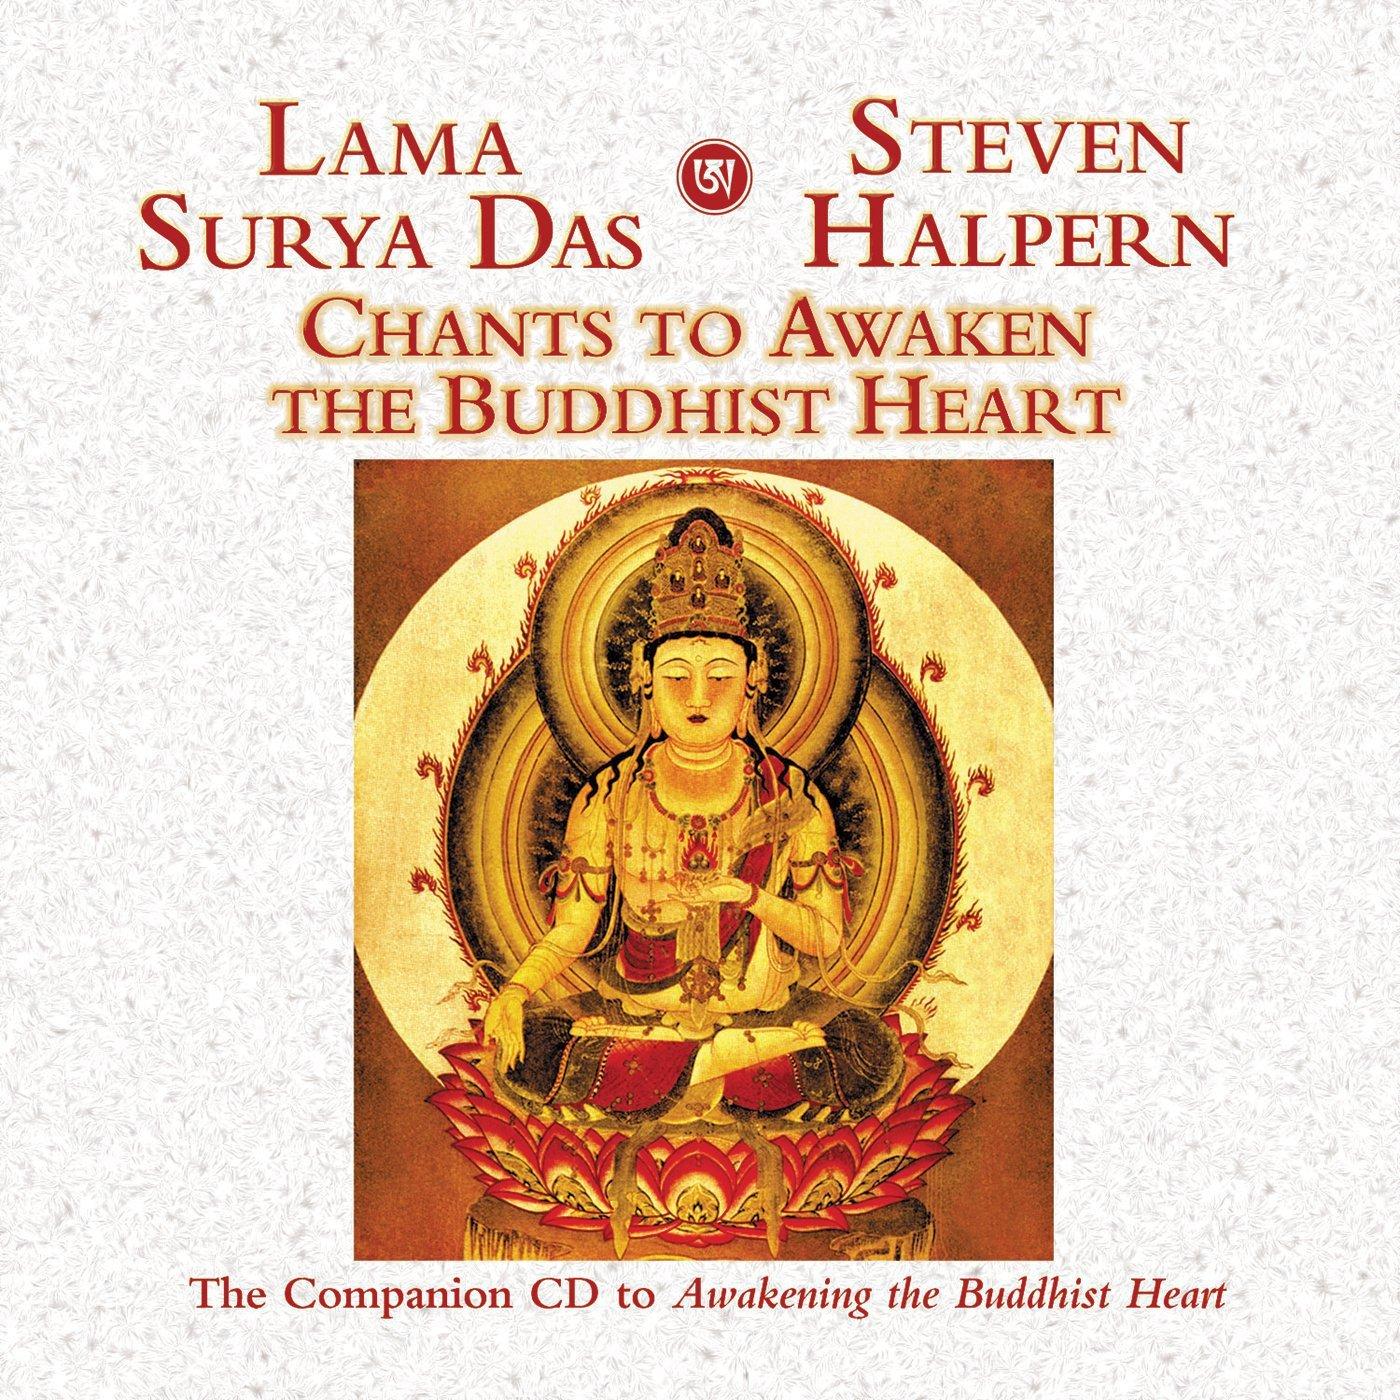 Chants to Awaken the Buddhist Heart by Inner Peace Music